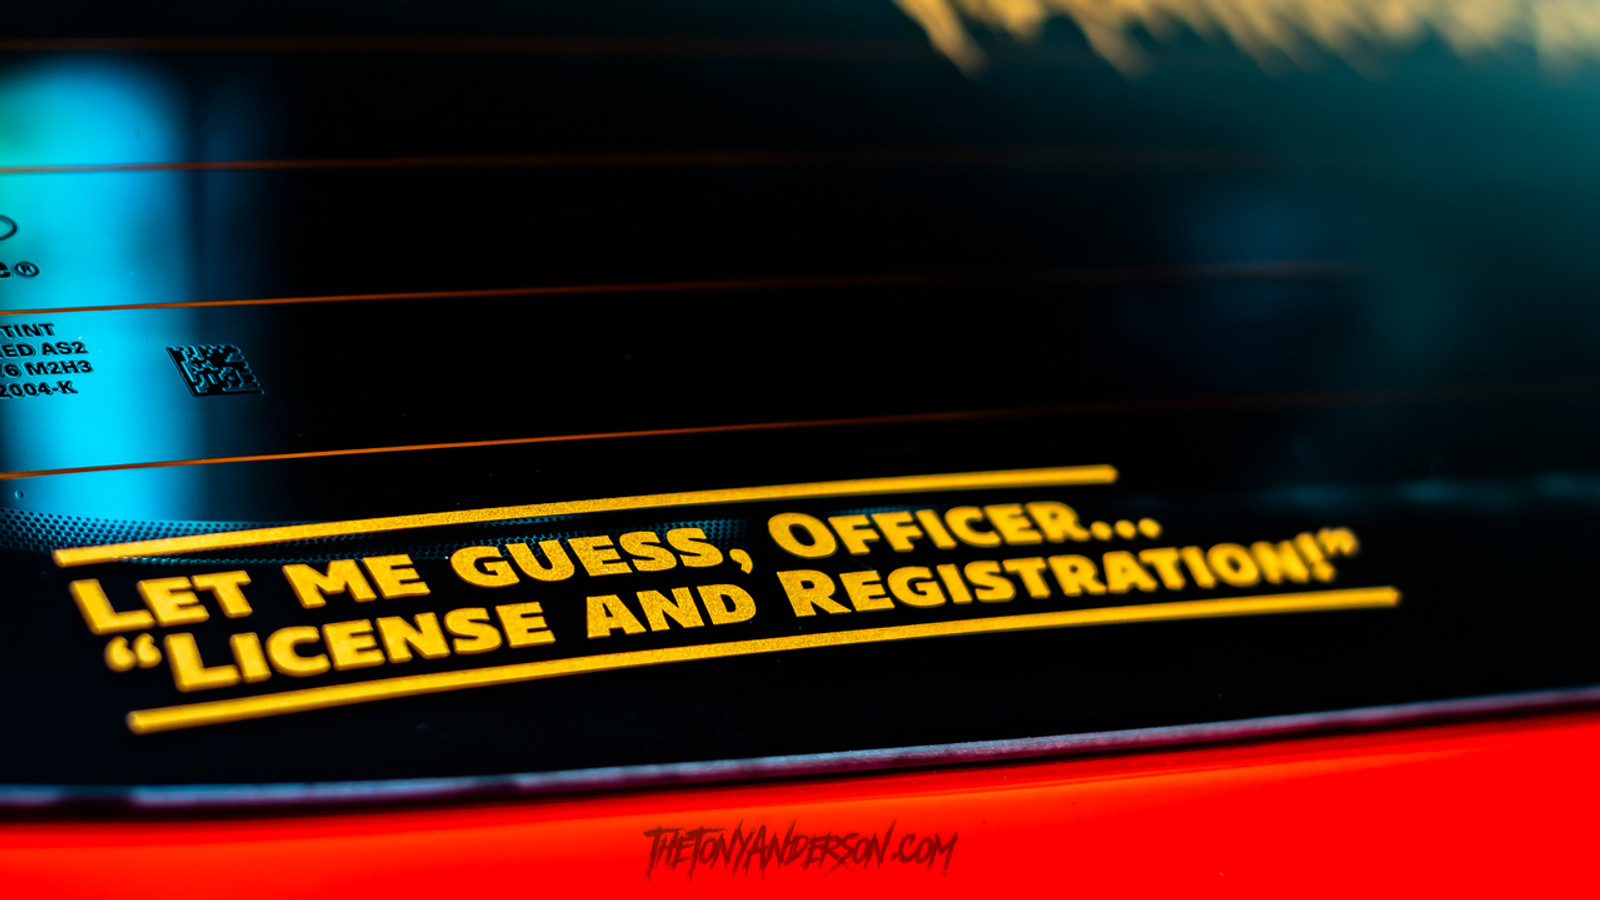 """Let Me Guess, Officer.."" vinyl sticker"